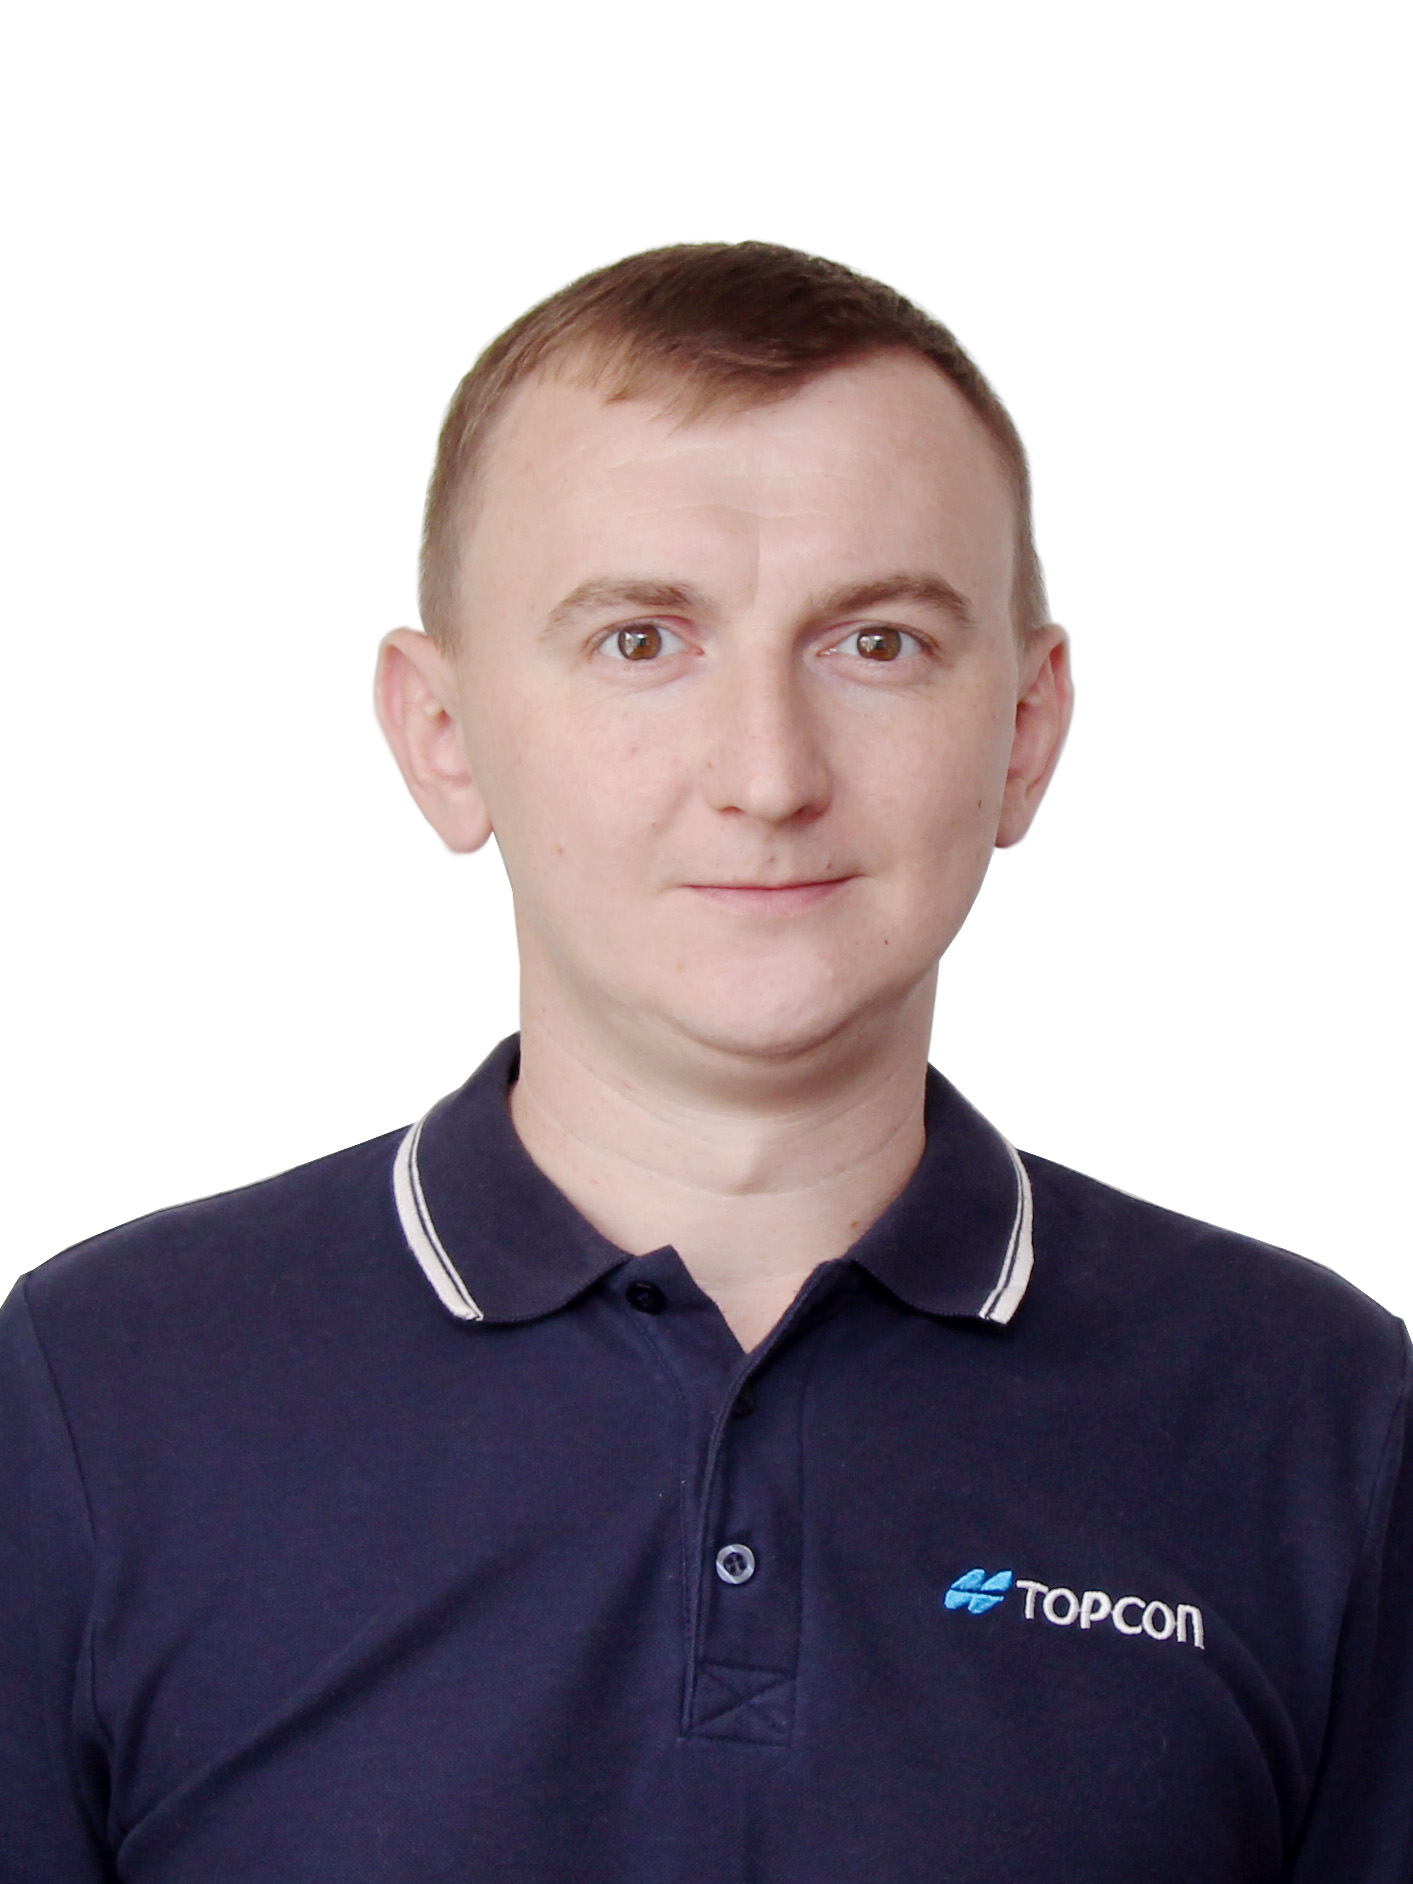 Талтыкин Владислав.jpg